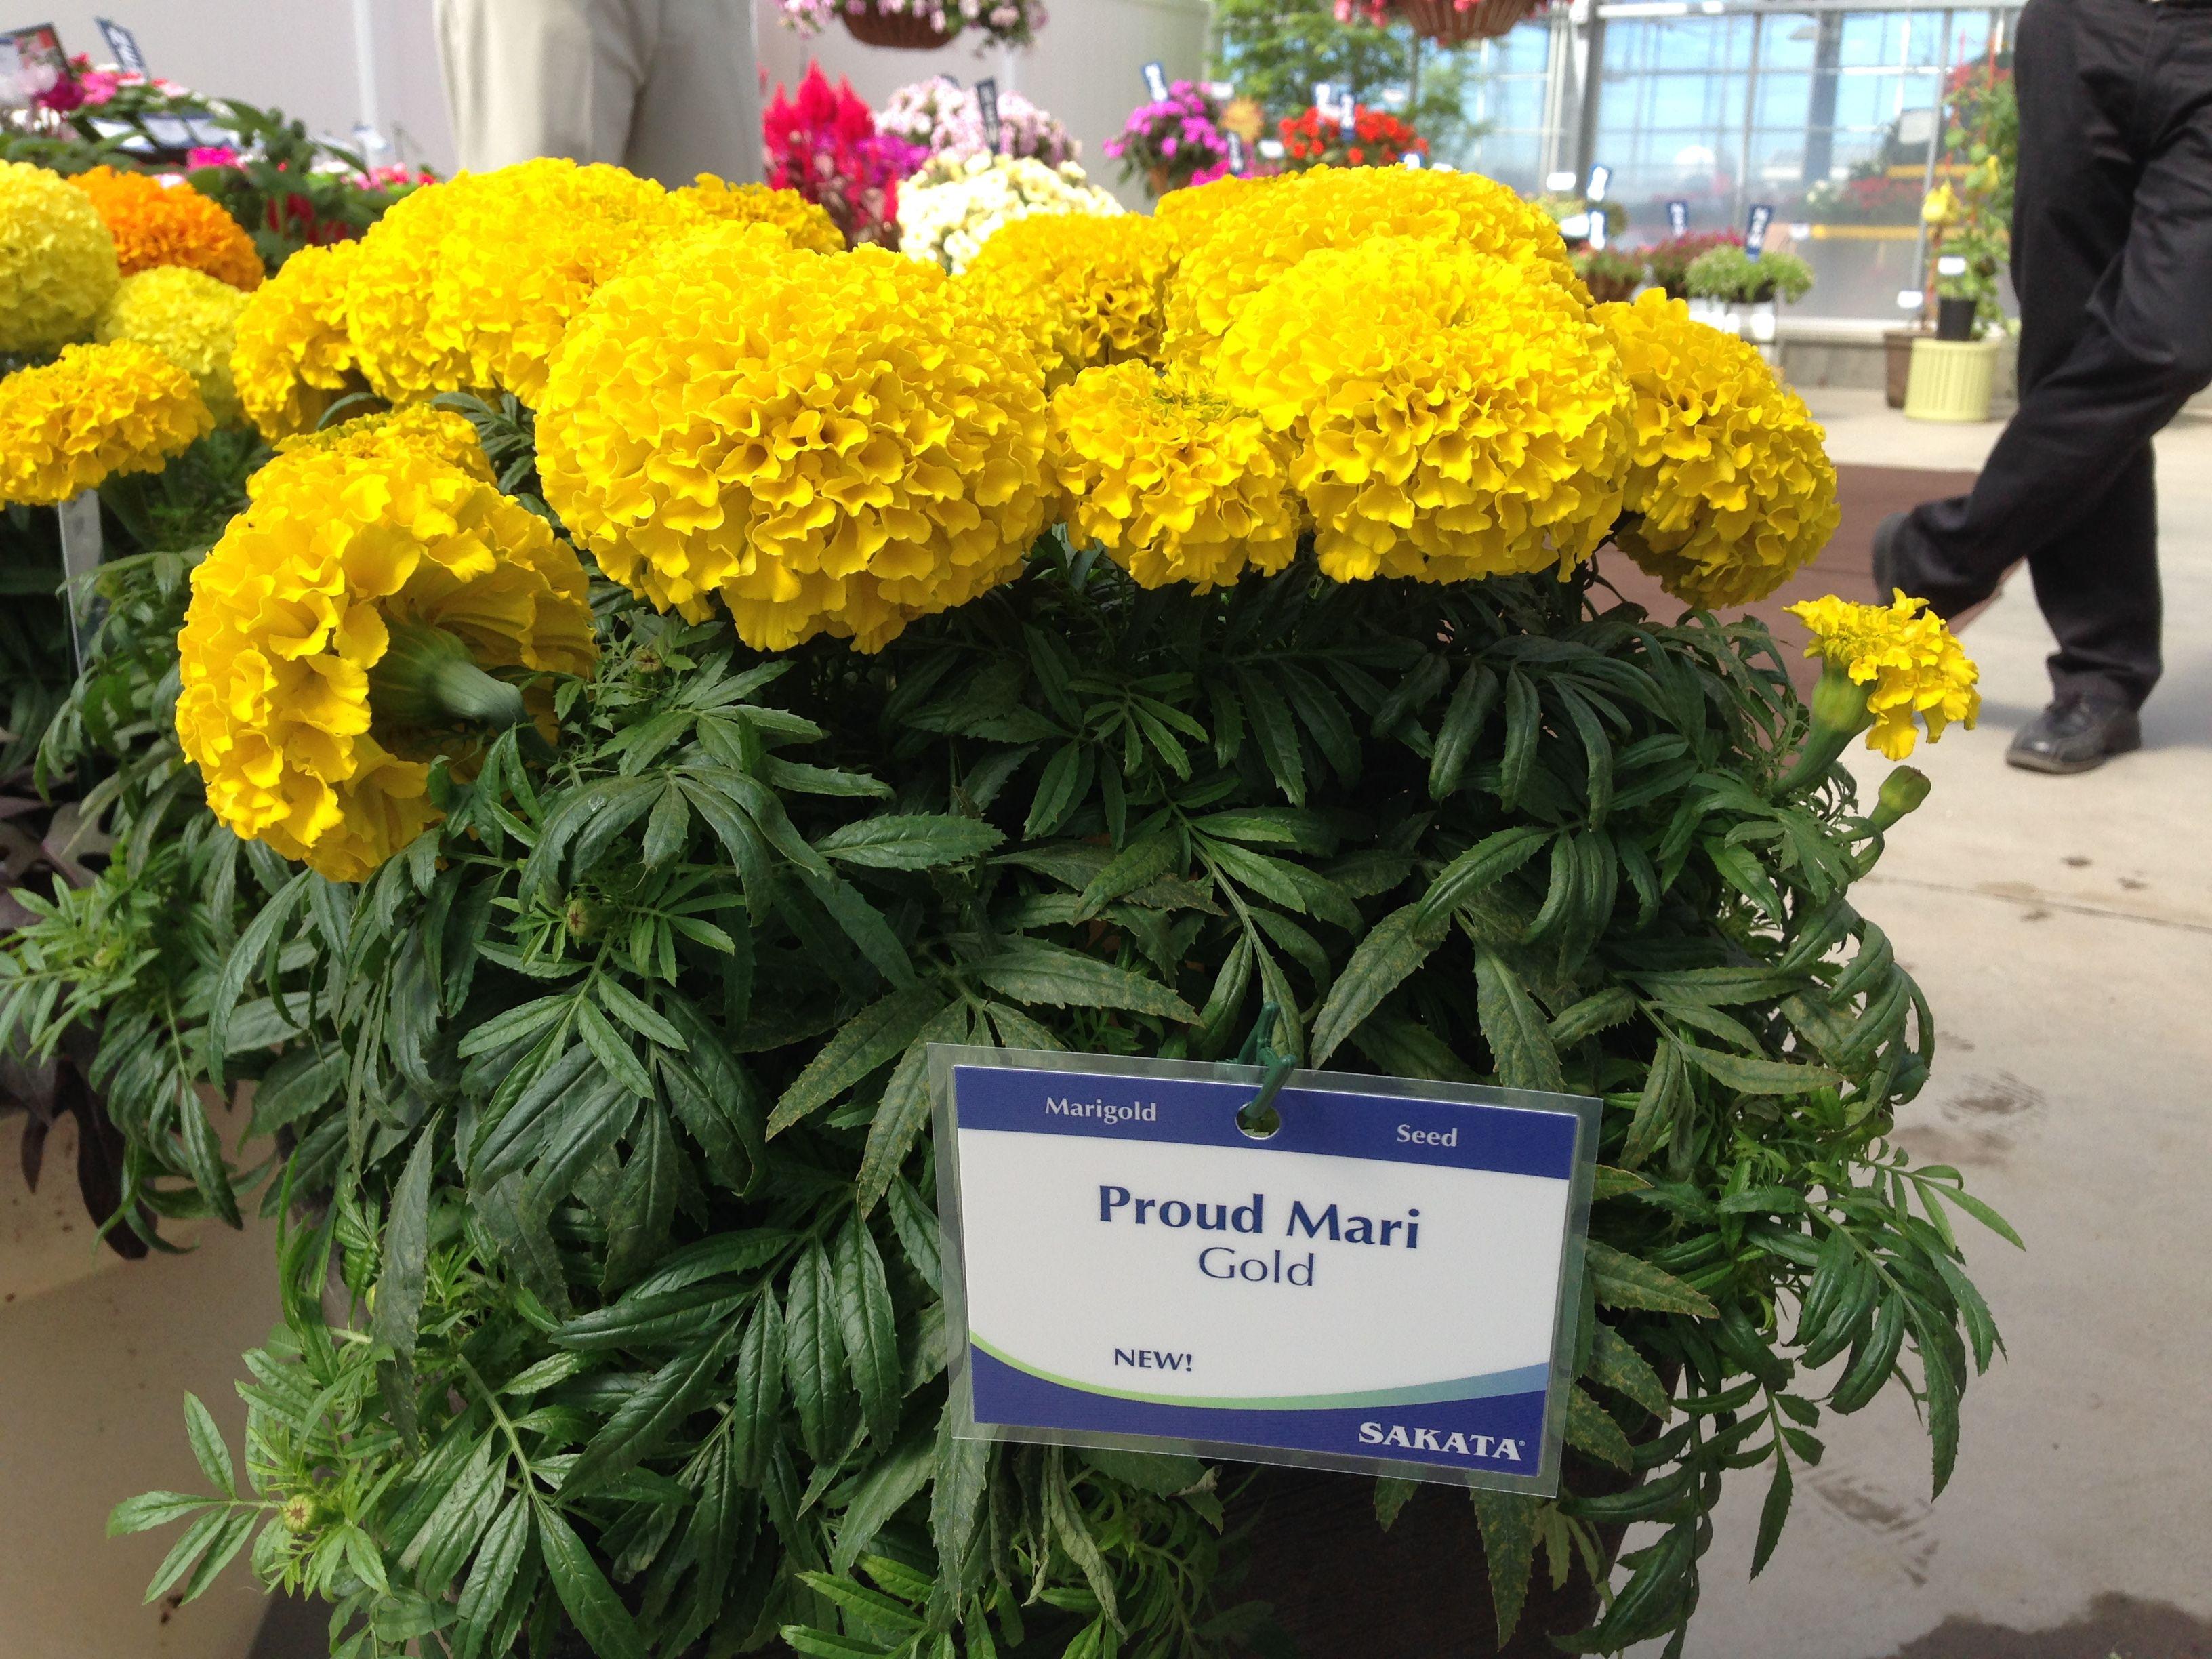 Marigold Proud Mari. Breeder Sakata Plants, Sakata, Marigold